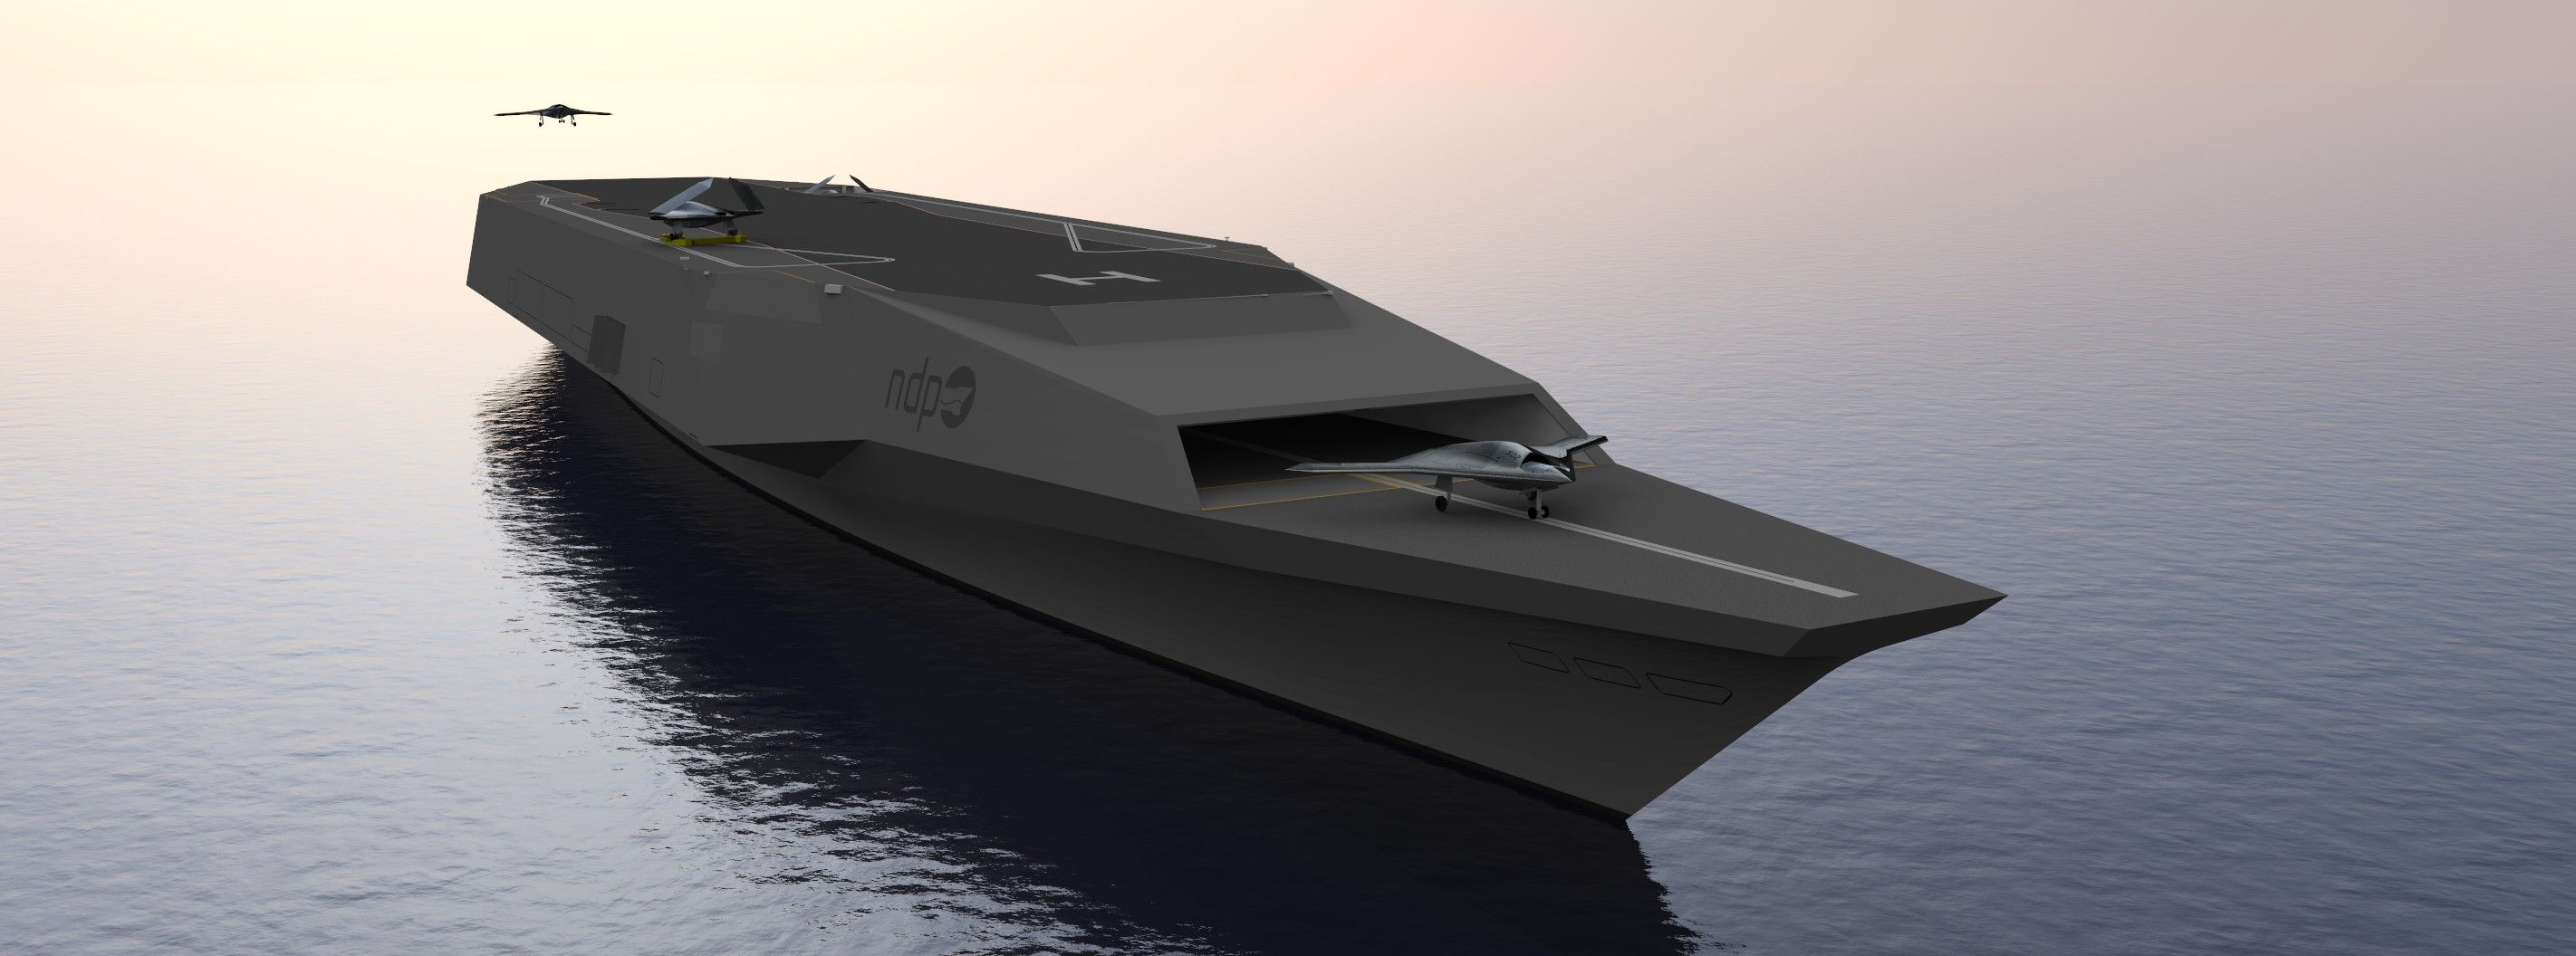 Výsledek obrázku pro us navy starship